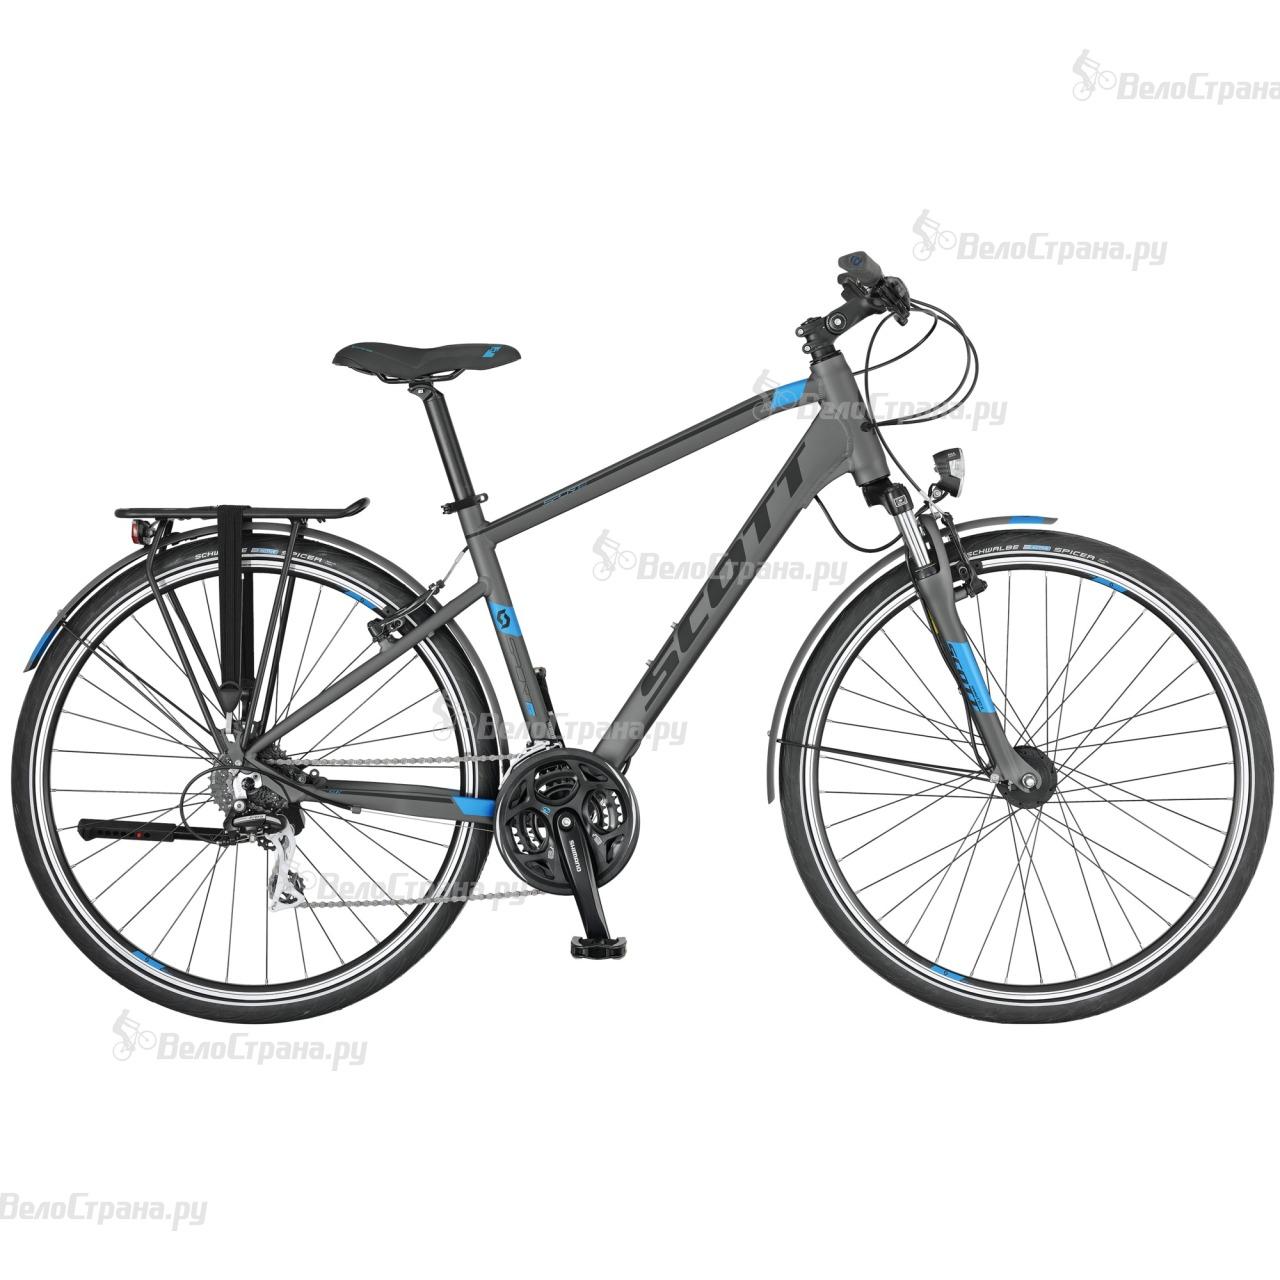 Велосипед Scott Sub Sport 30 Men (2017)